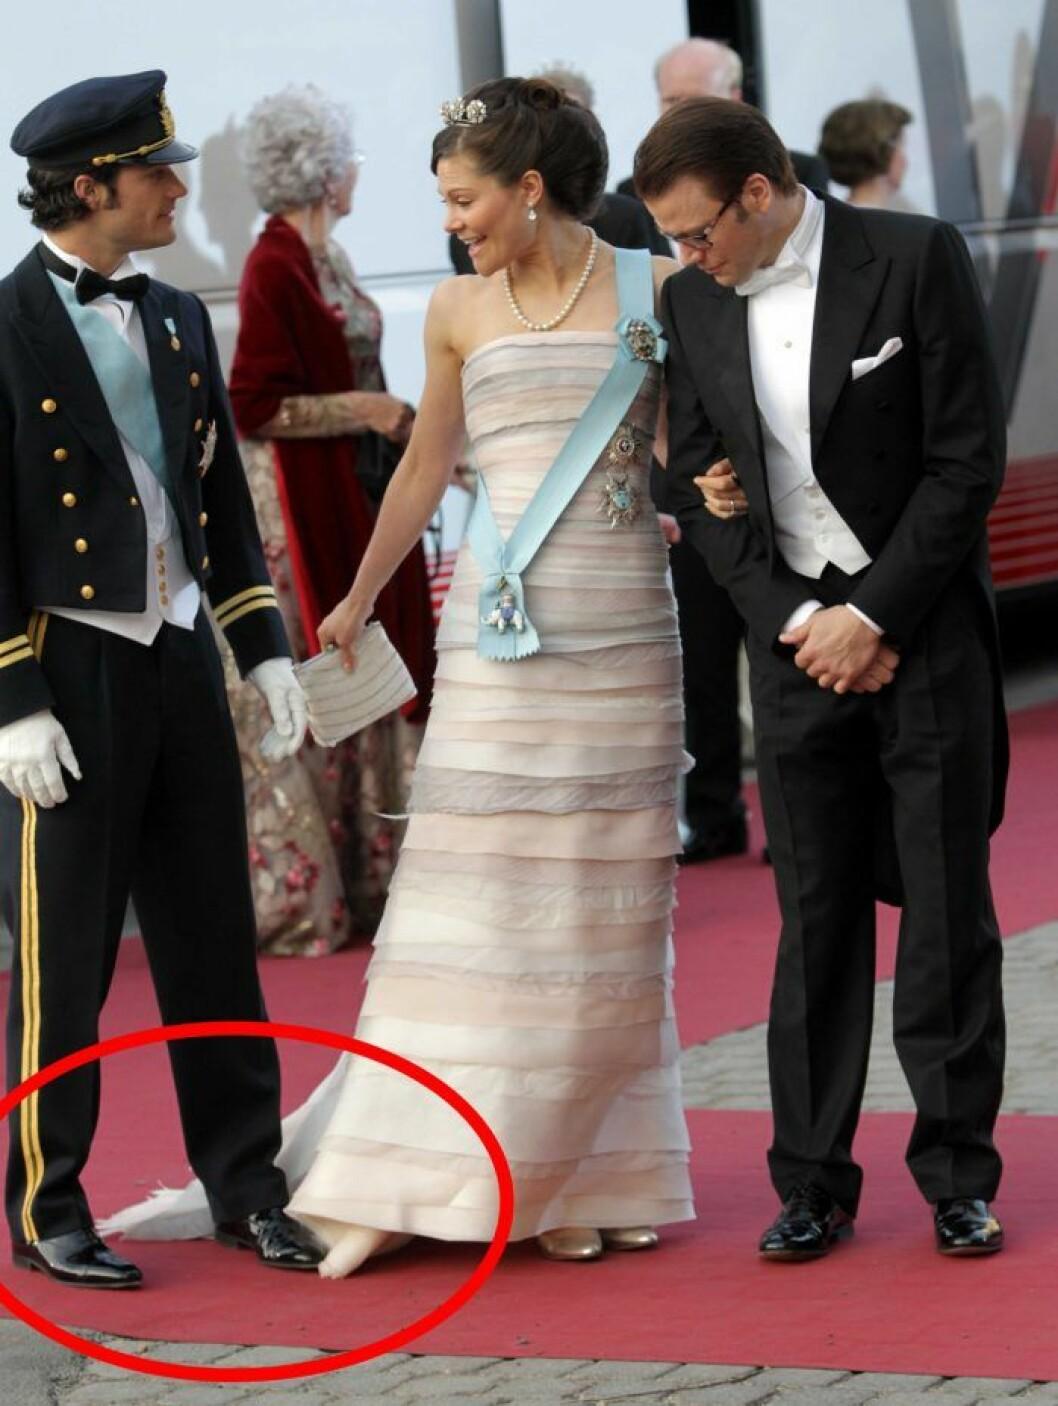 Prins Carl Philip kliver på kronprinsessan Victorias släp.